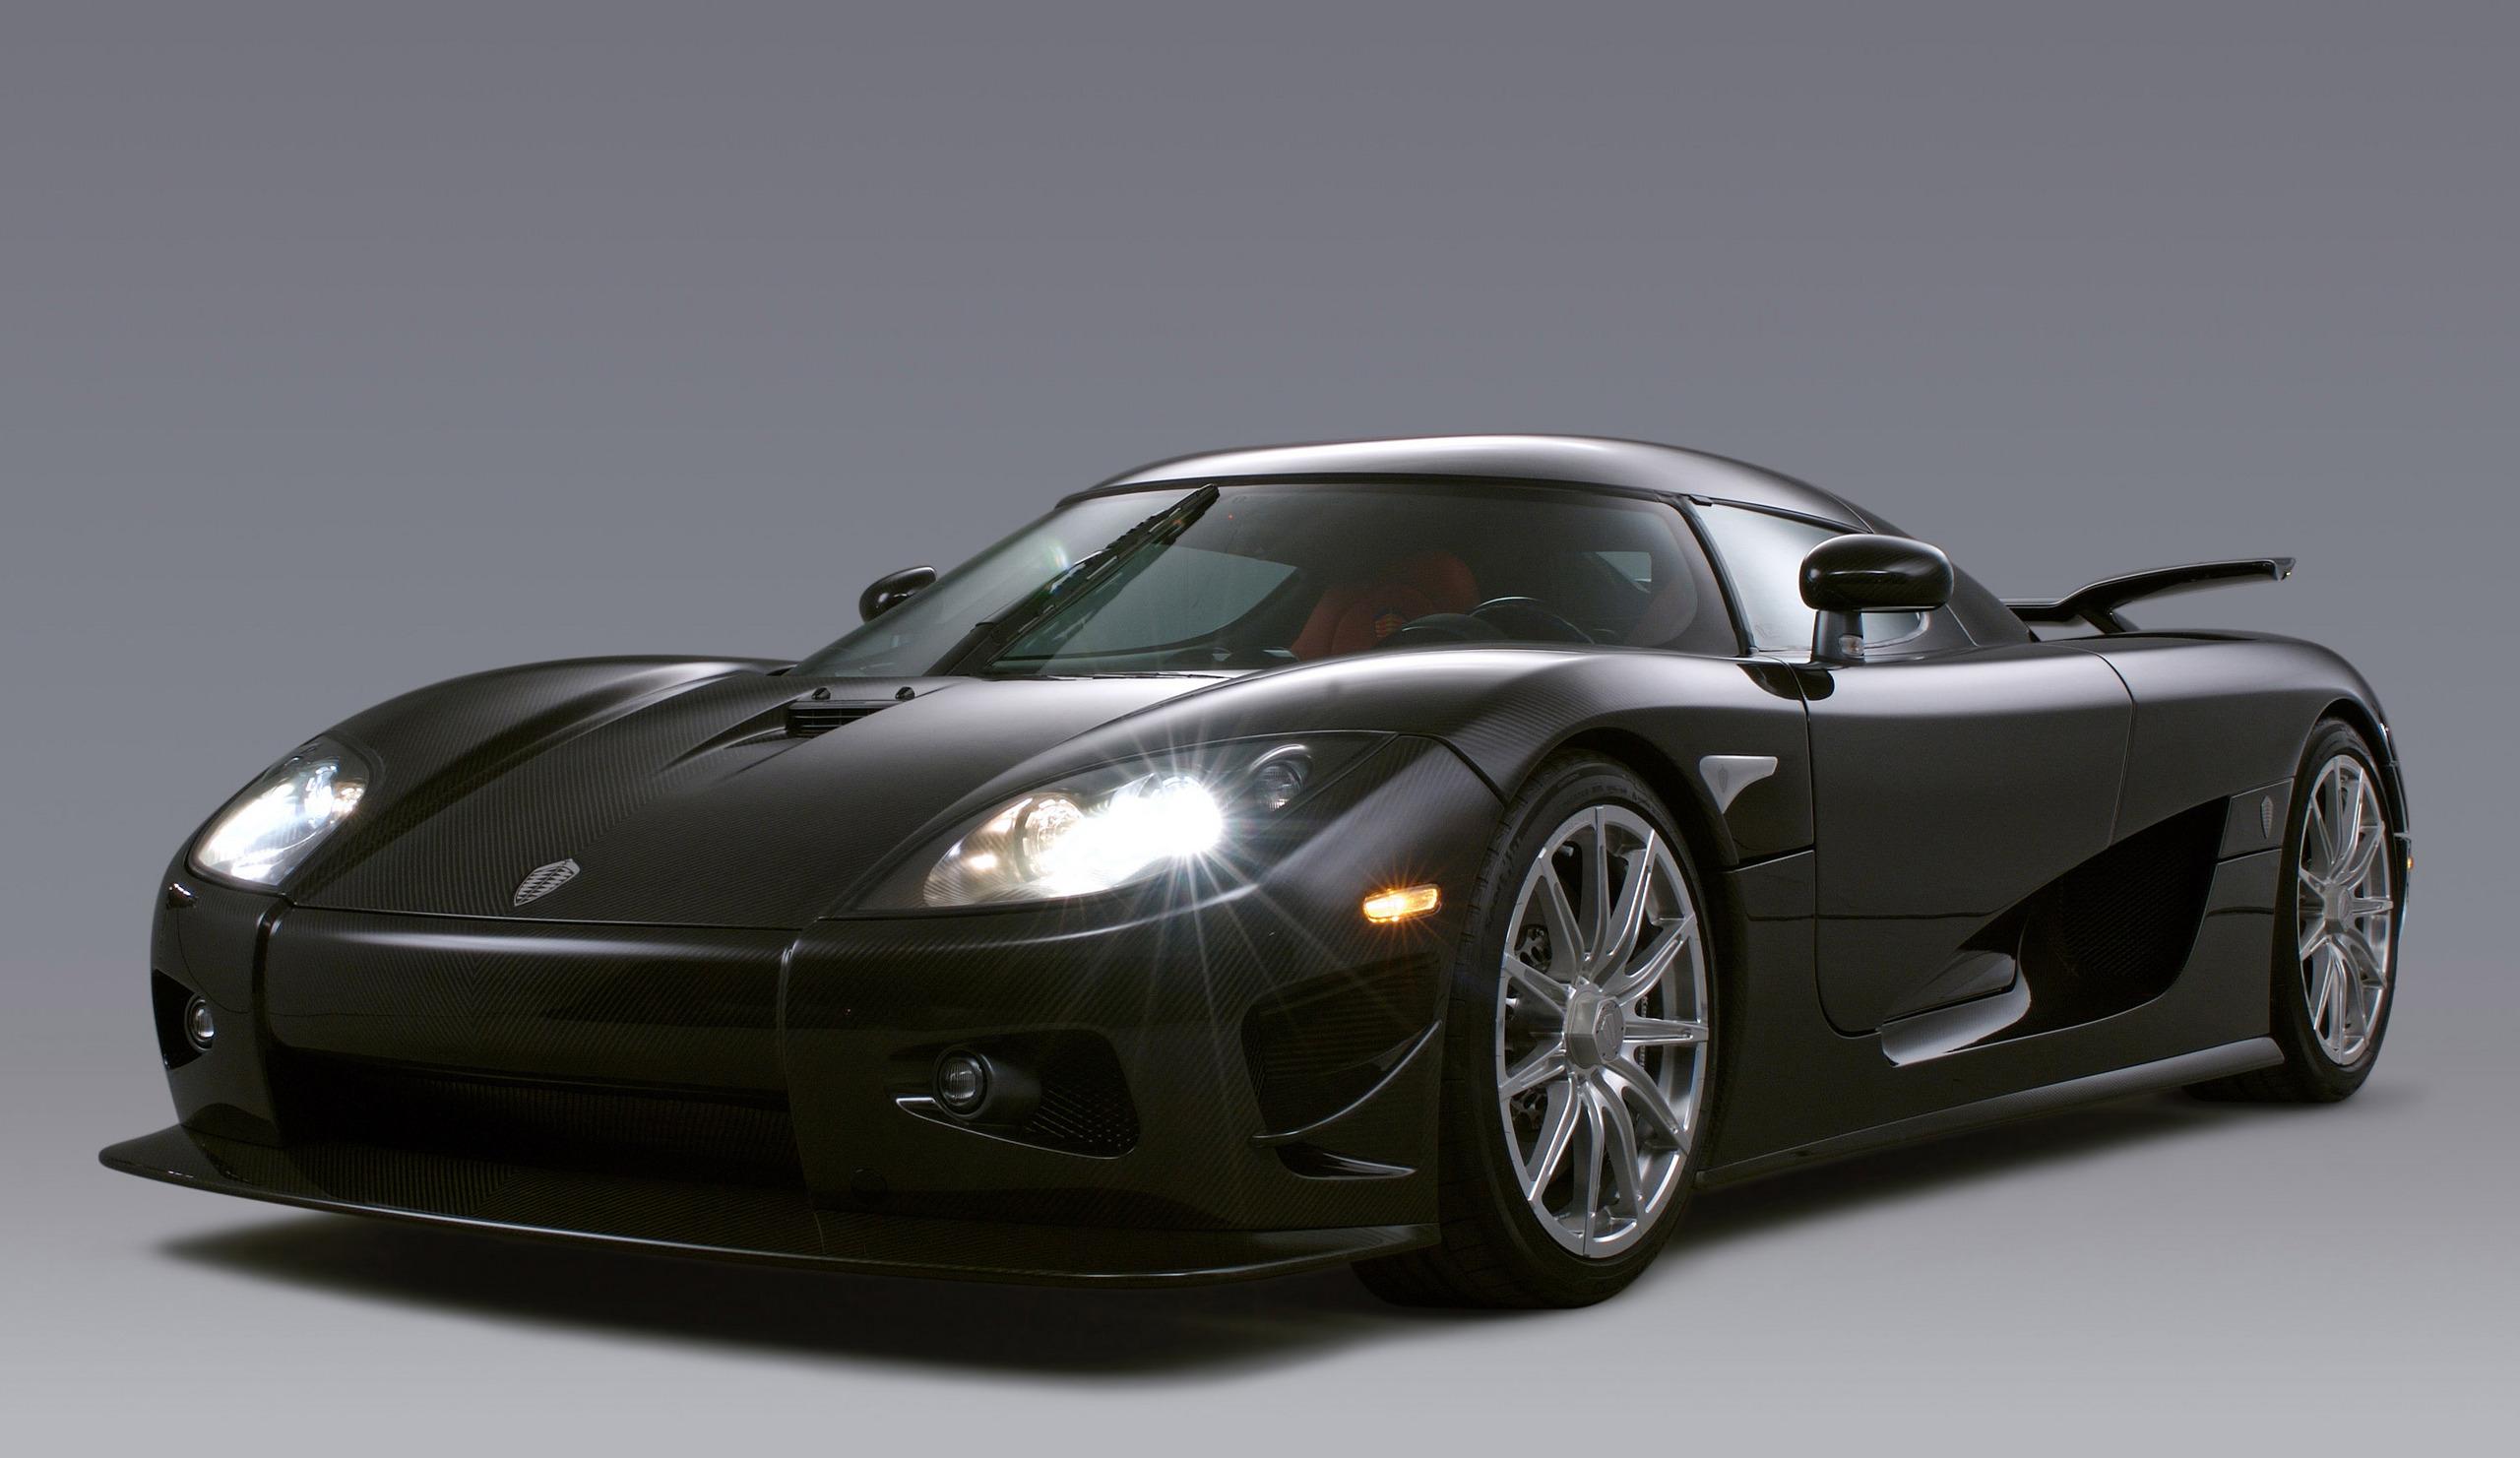 Pagani Zonda R Hd Wallpaper Exotic Cars Images Koenigsegg Ccxr Hd Wallpaper And